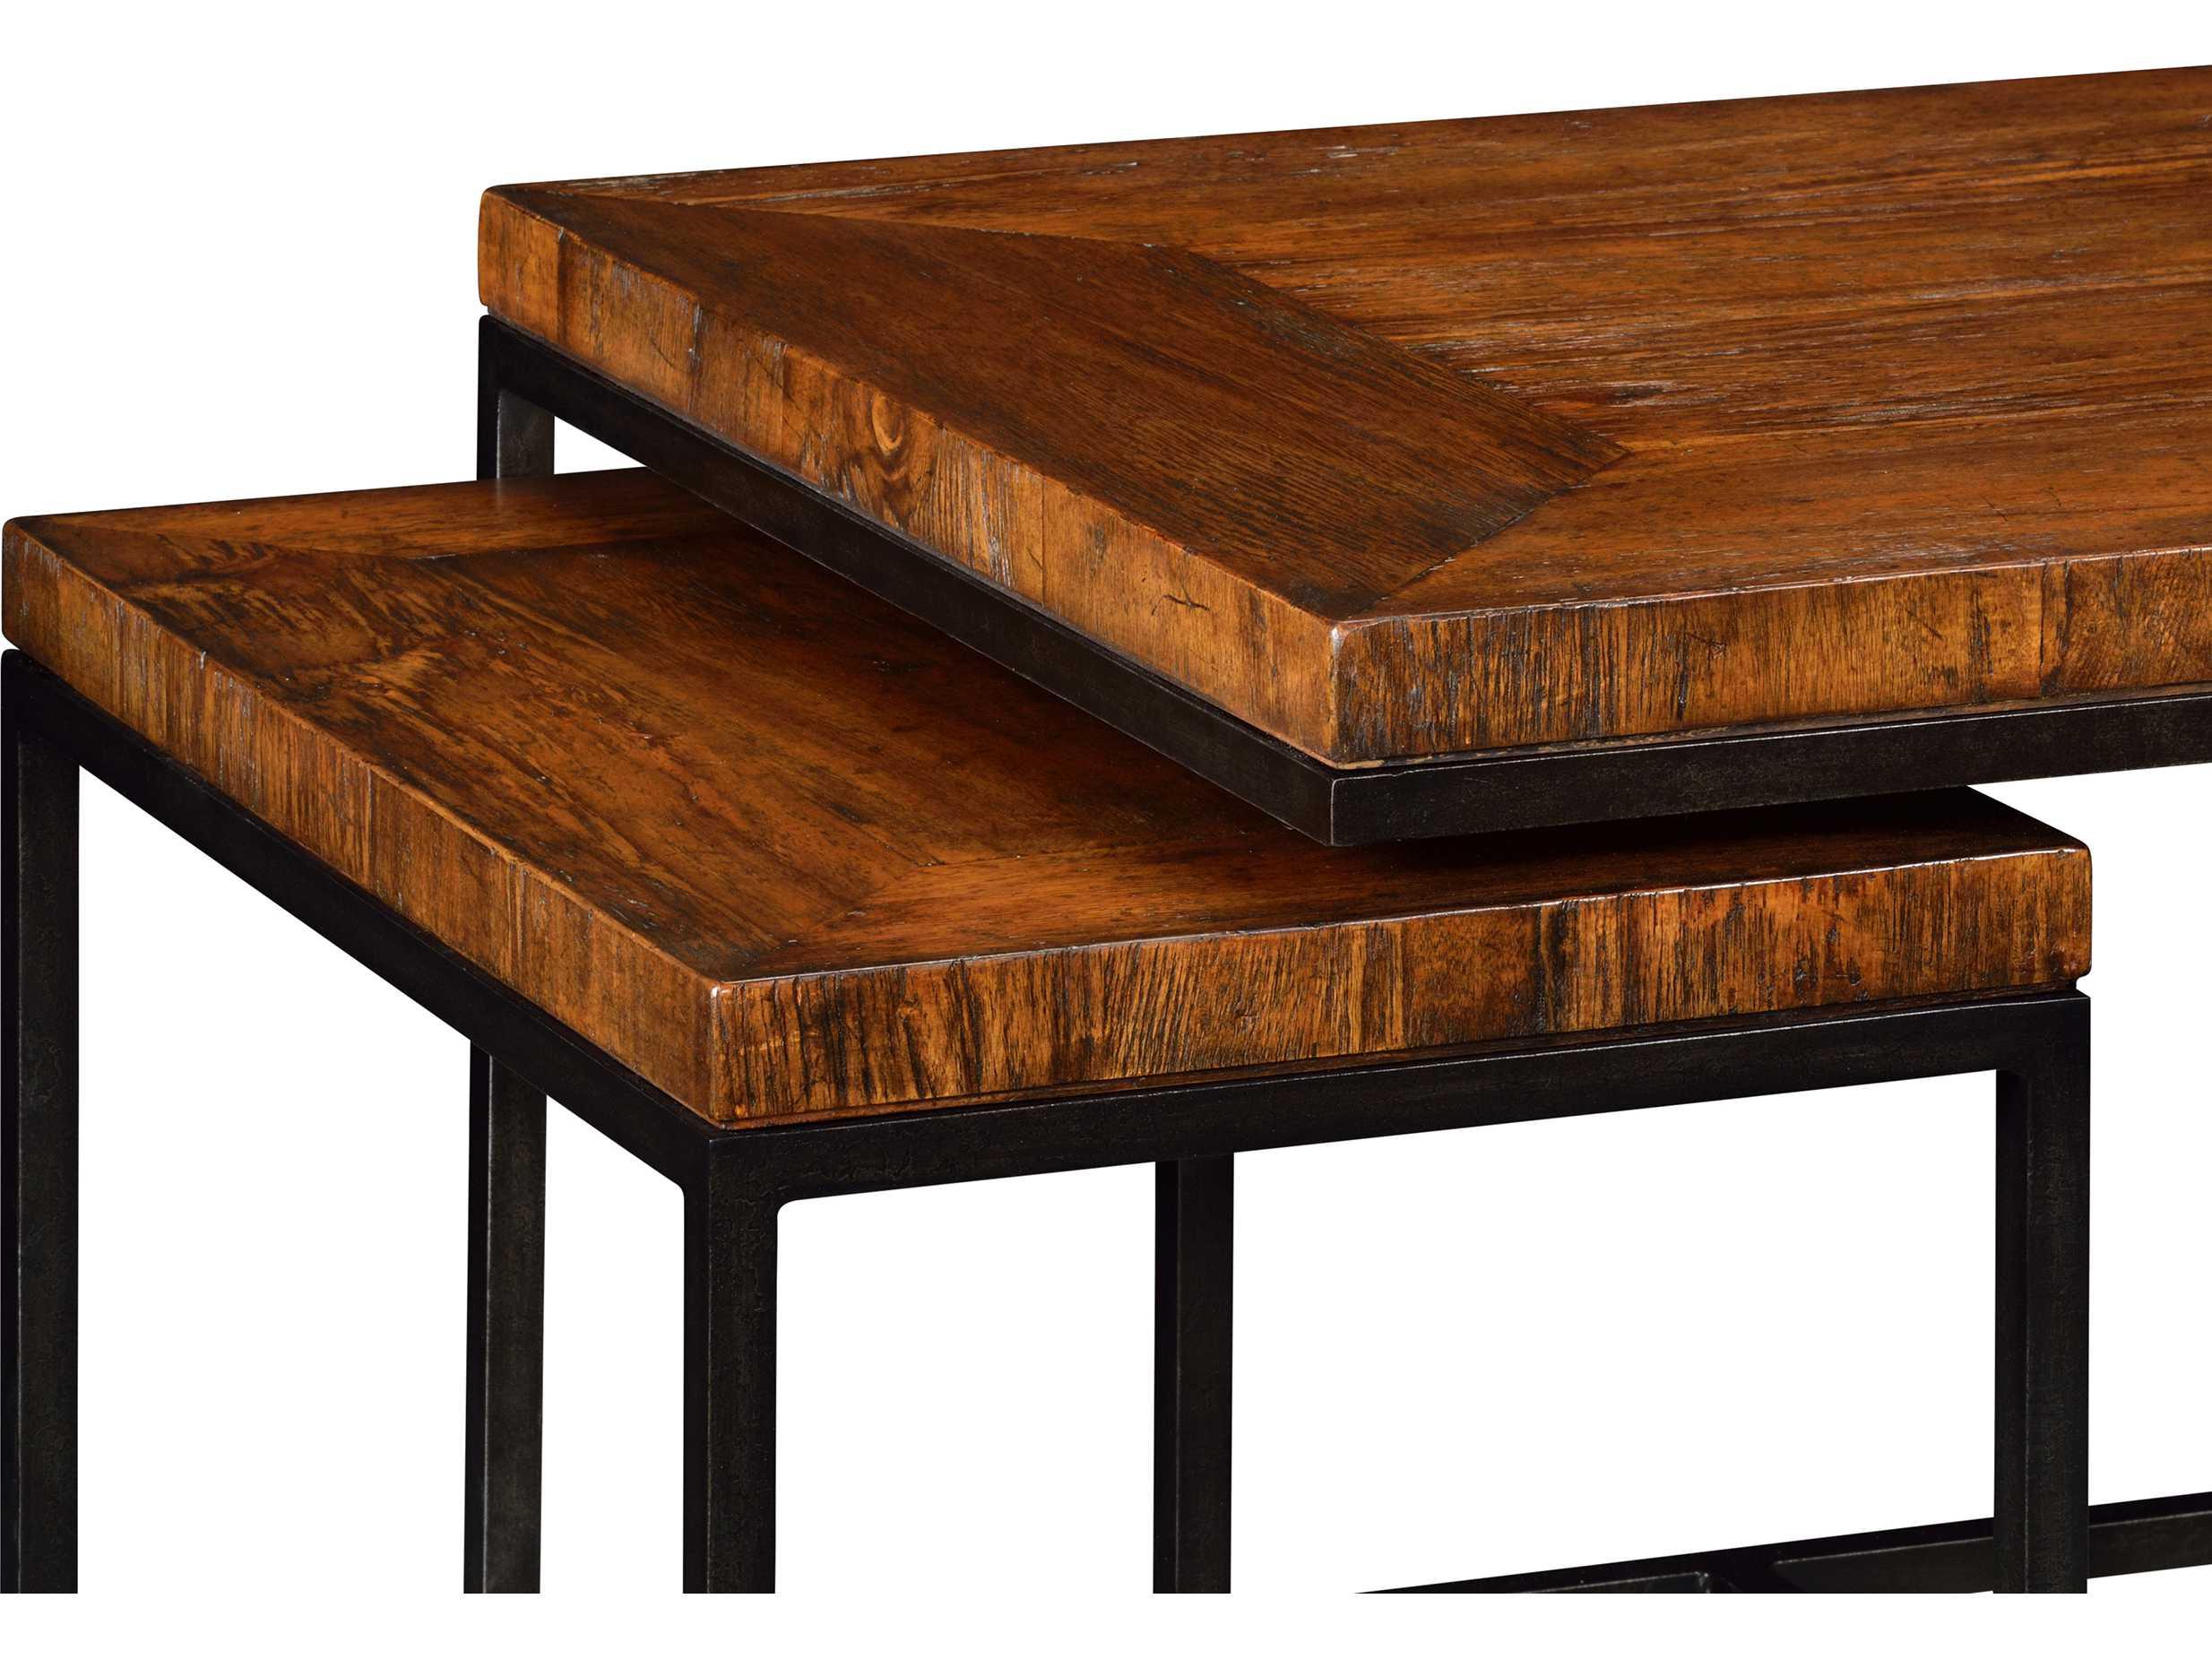 Jonathan Charles Artisan Collection Rustic Walnut Finish Coffee Table Jc495422rwl